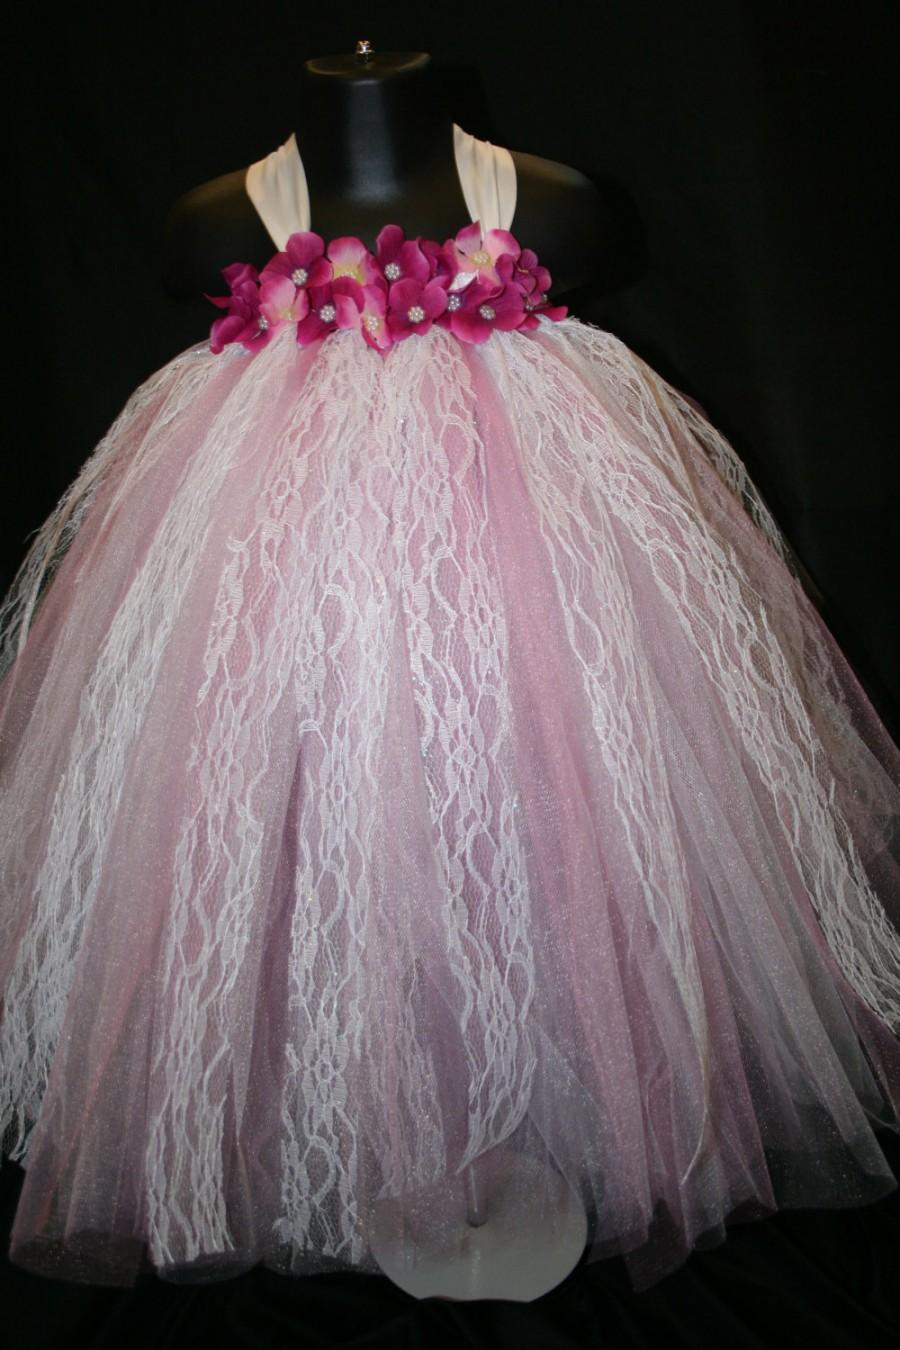 Wedding - Pink and White Lace Tutu Dress, Tutu Dress, Flower Girl Tutu Dress, Flower Girl, Rose and White Tutu Dress, Tulle and Lace Tutu Dress